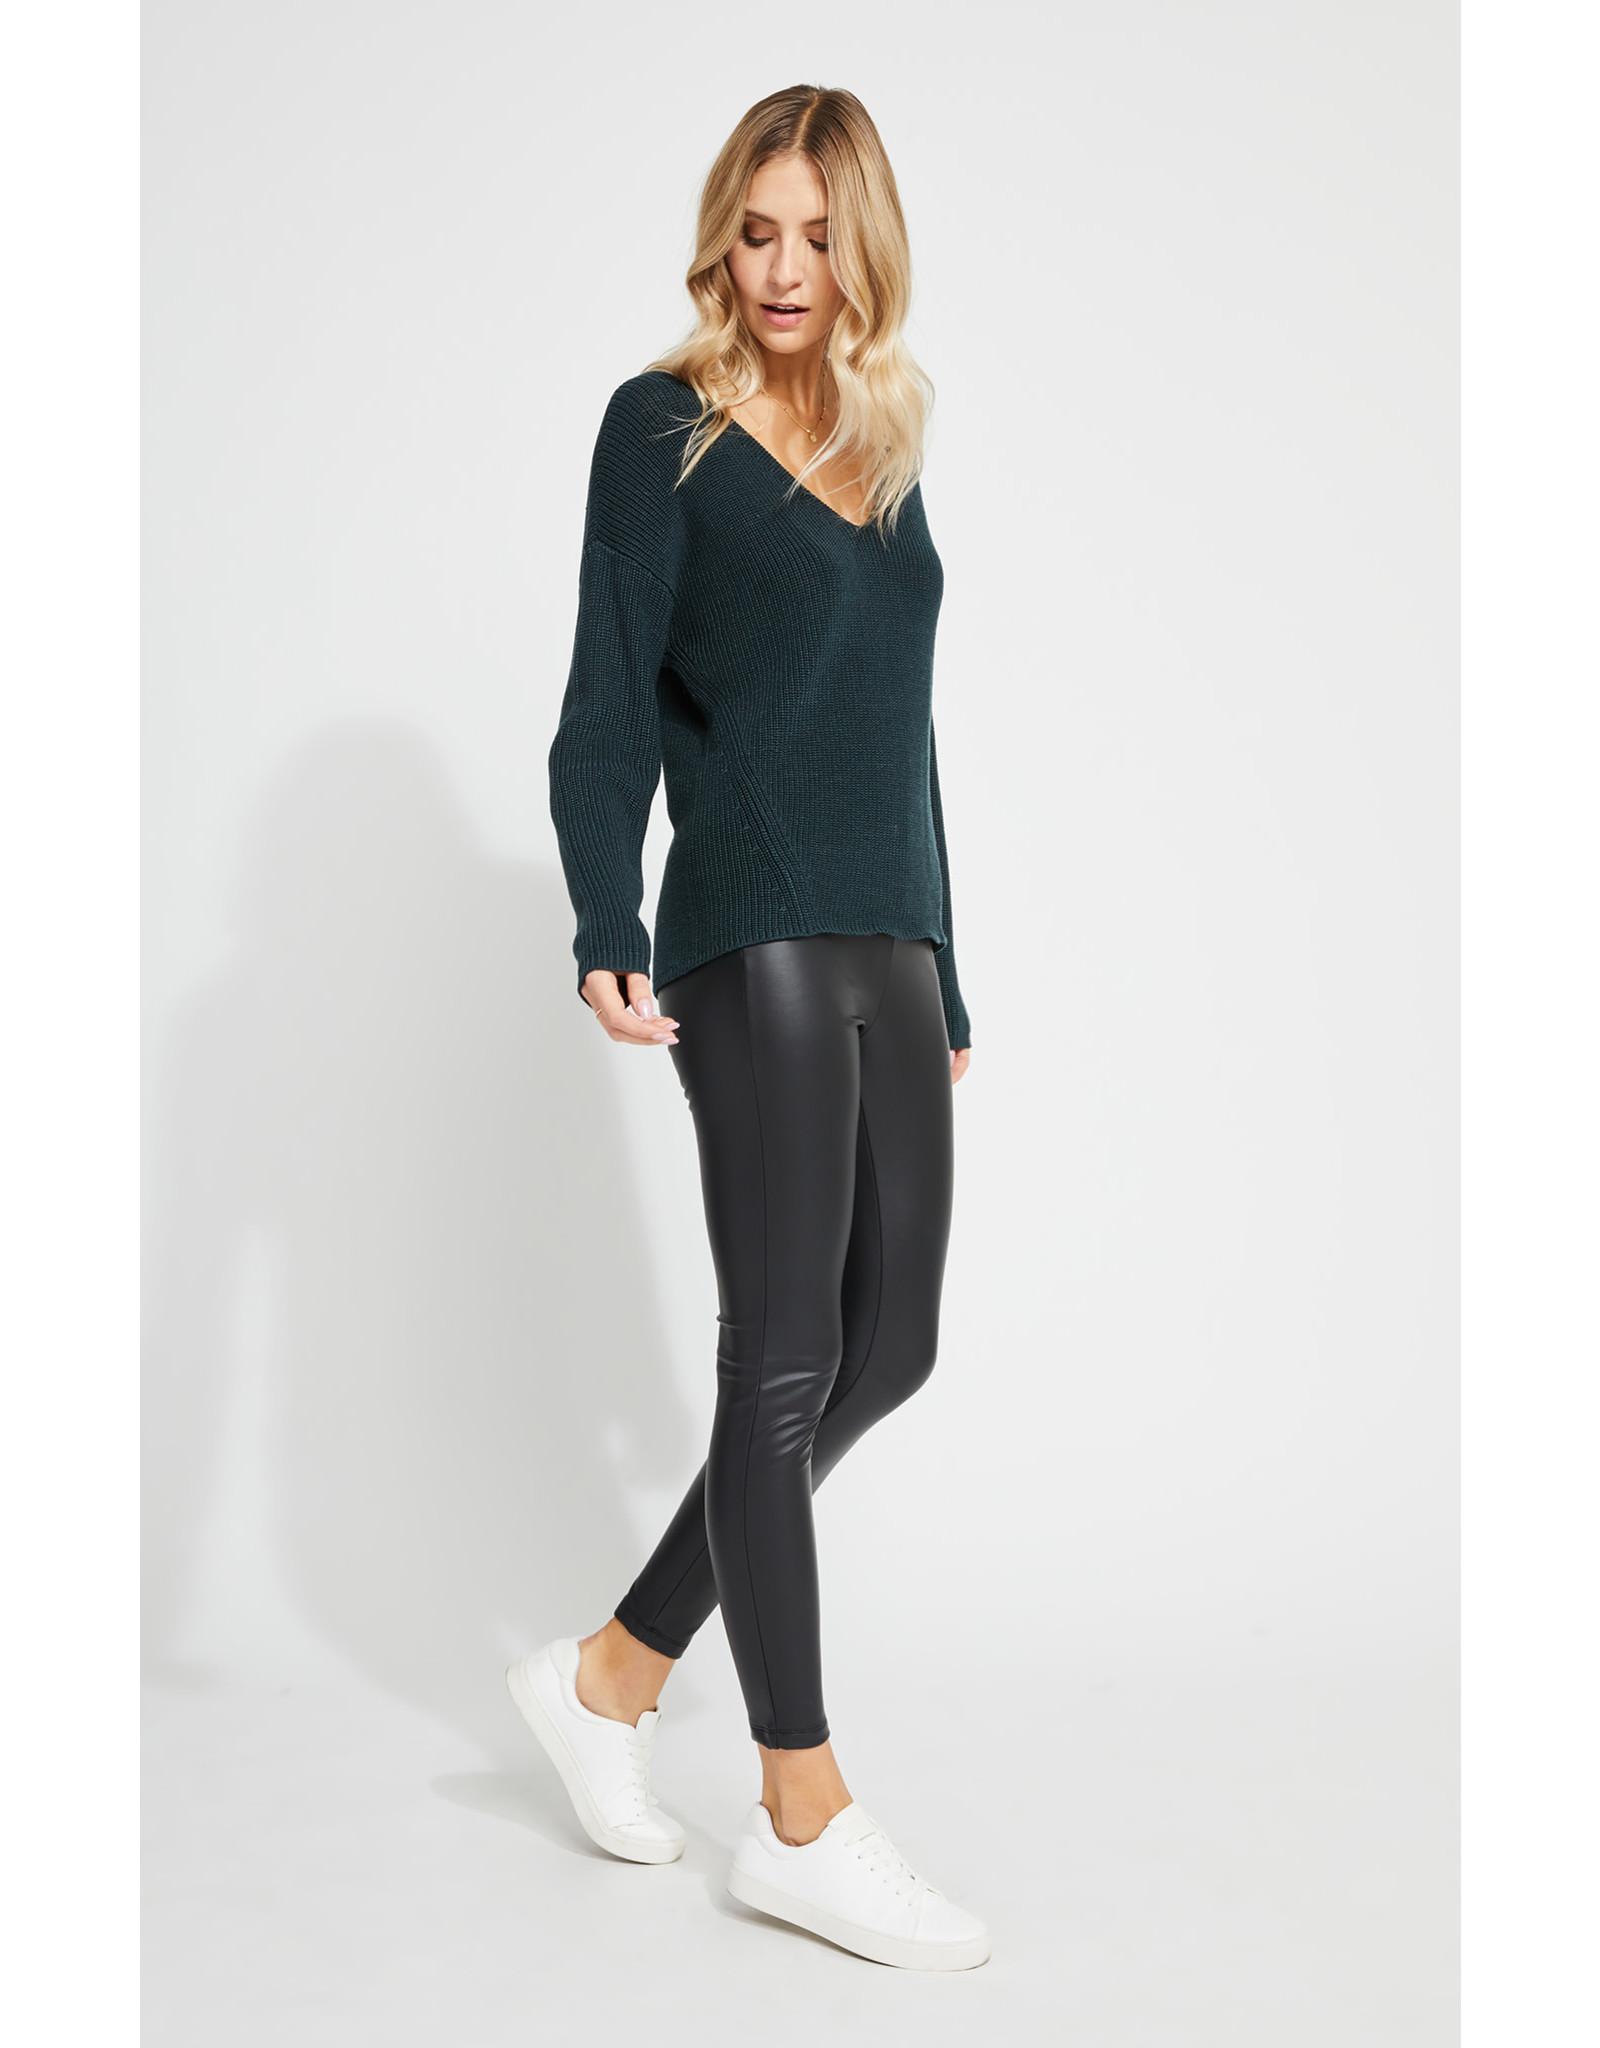 Gentle Fawn - Carefree Sweater